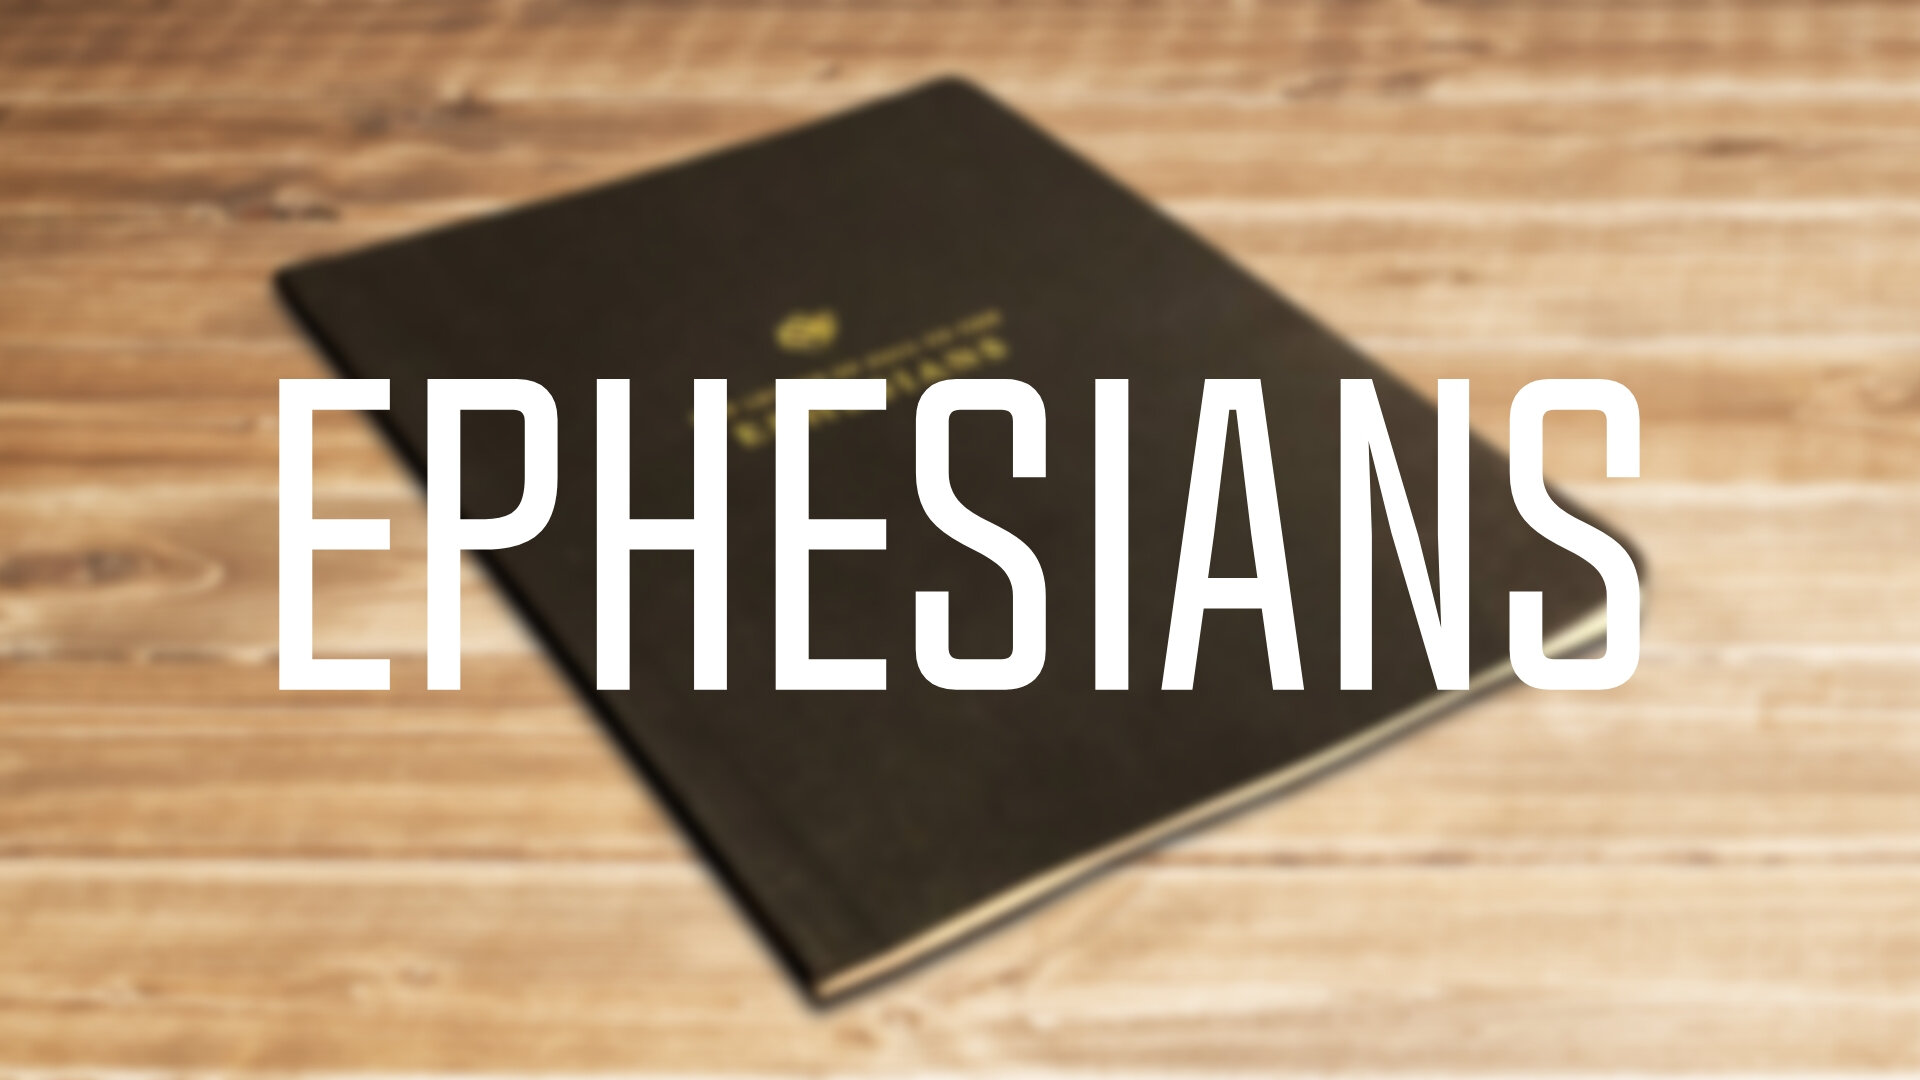 Ephesians #1      Ephesians #2      Ephesians #3